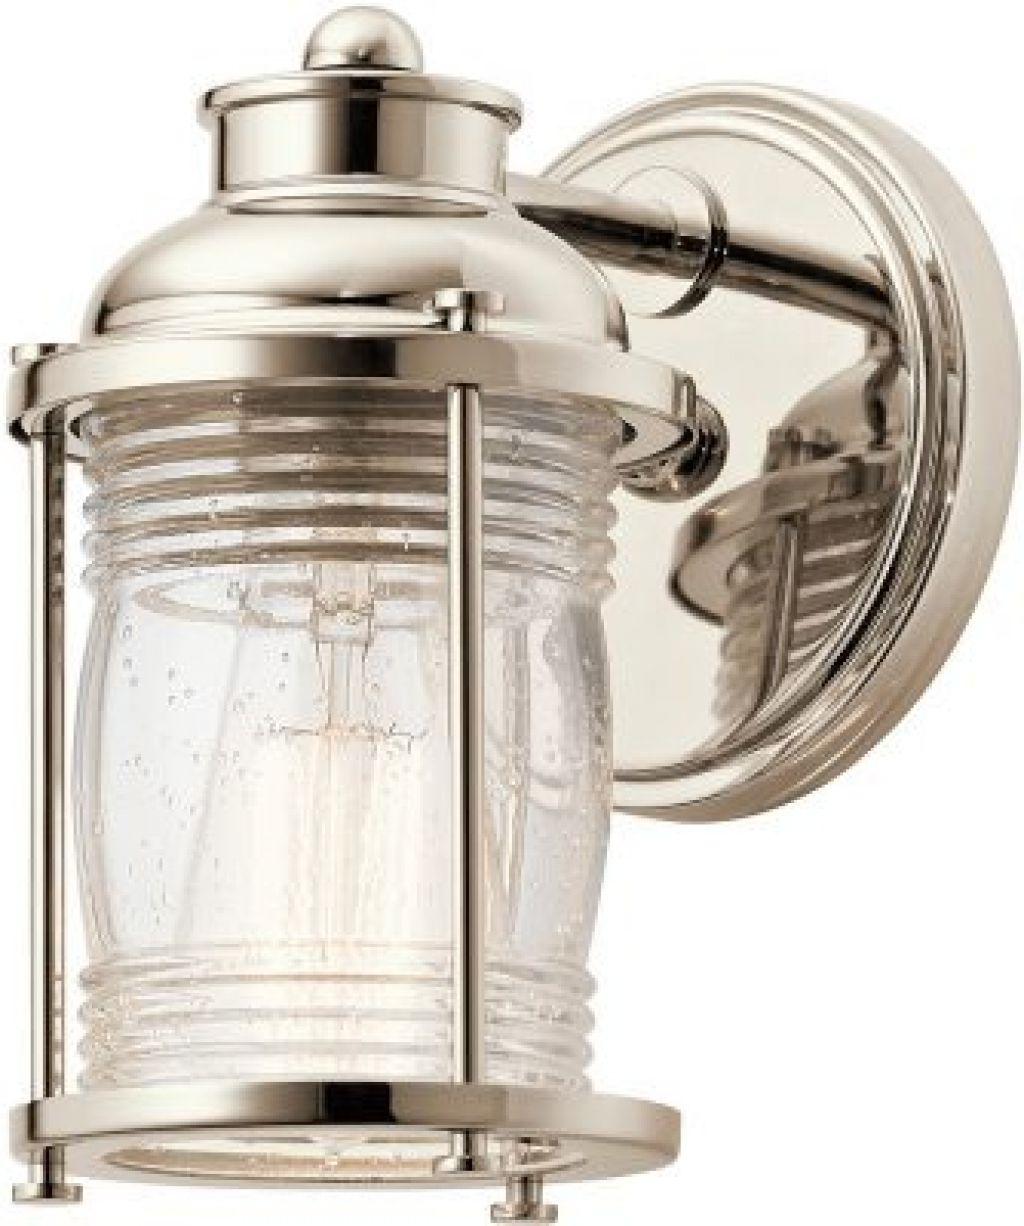 nautical bathroom lights. 15 Inspiring Nautical Lights For Bathroom Inspirational N